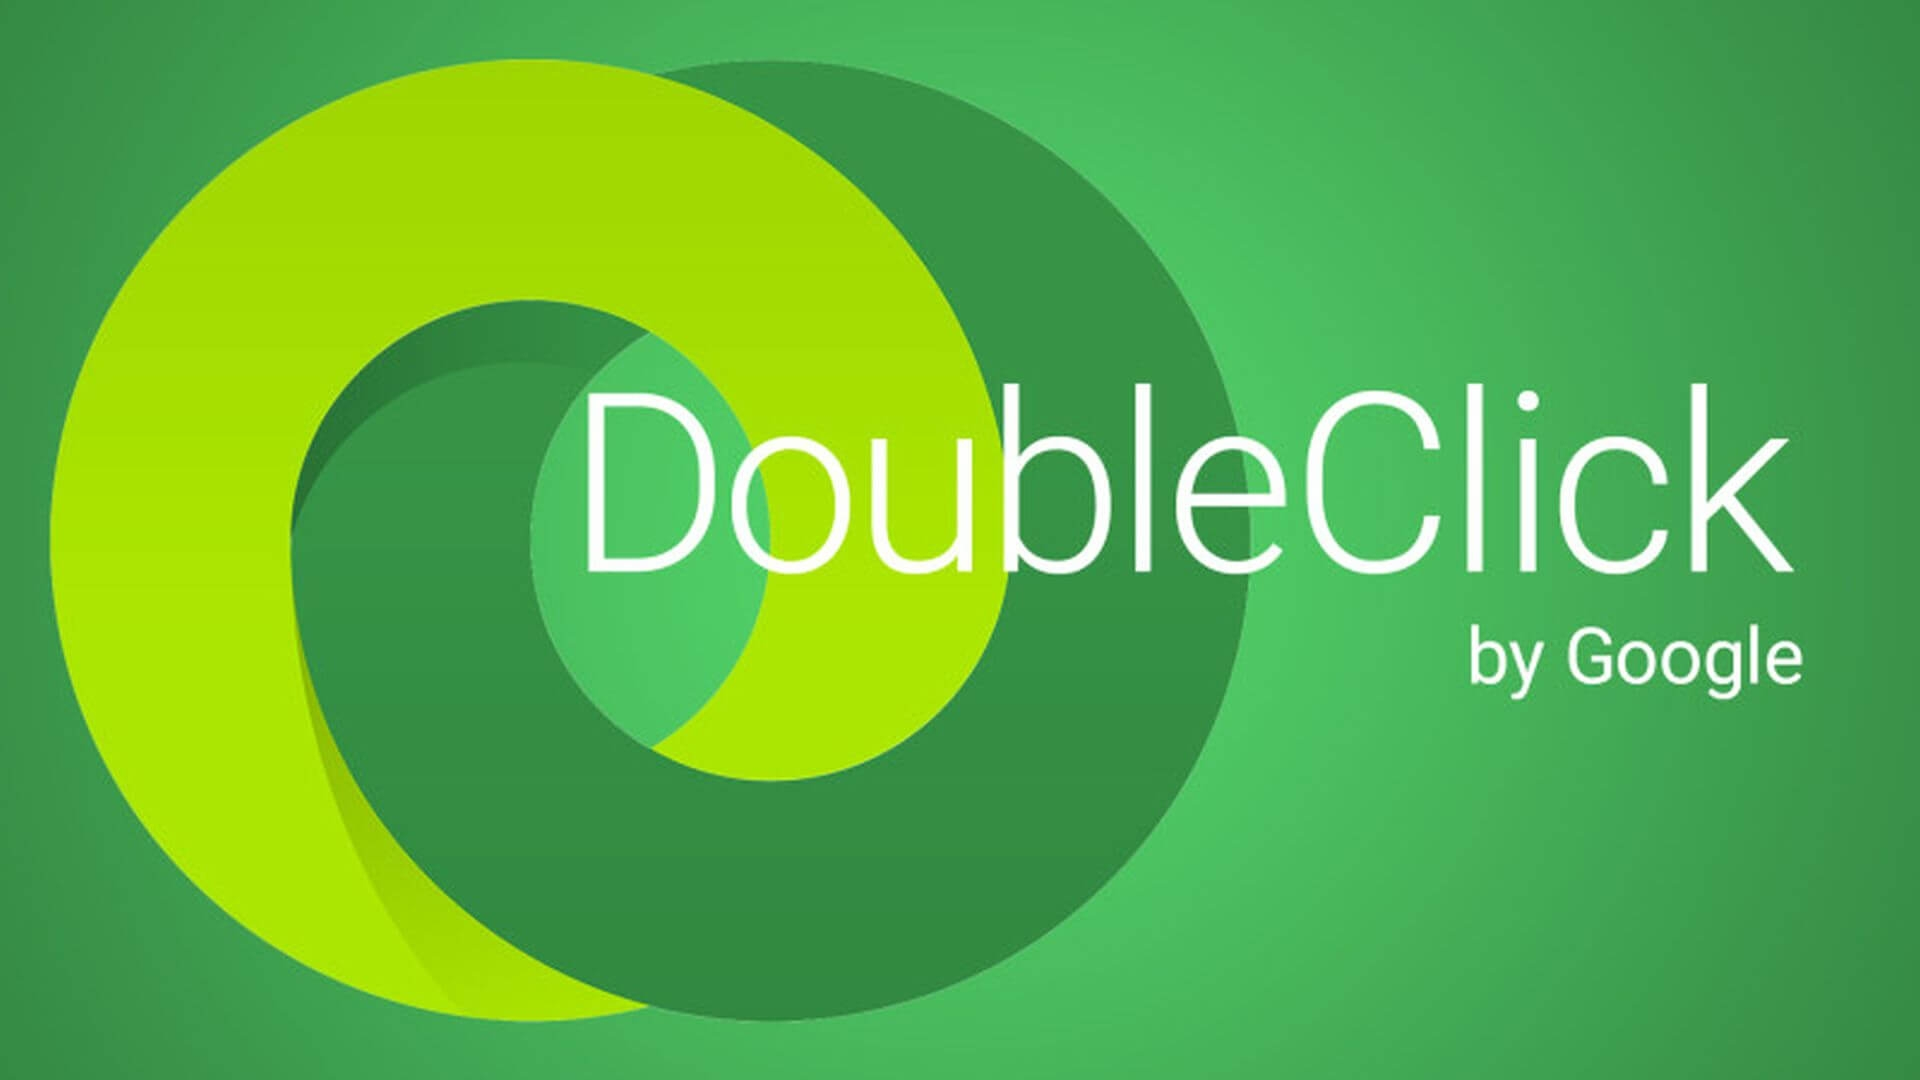 google-doubleclick-logo